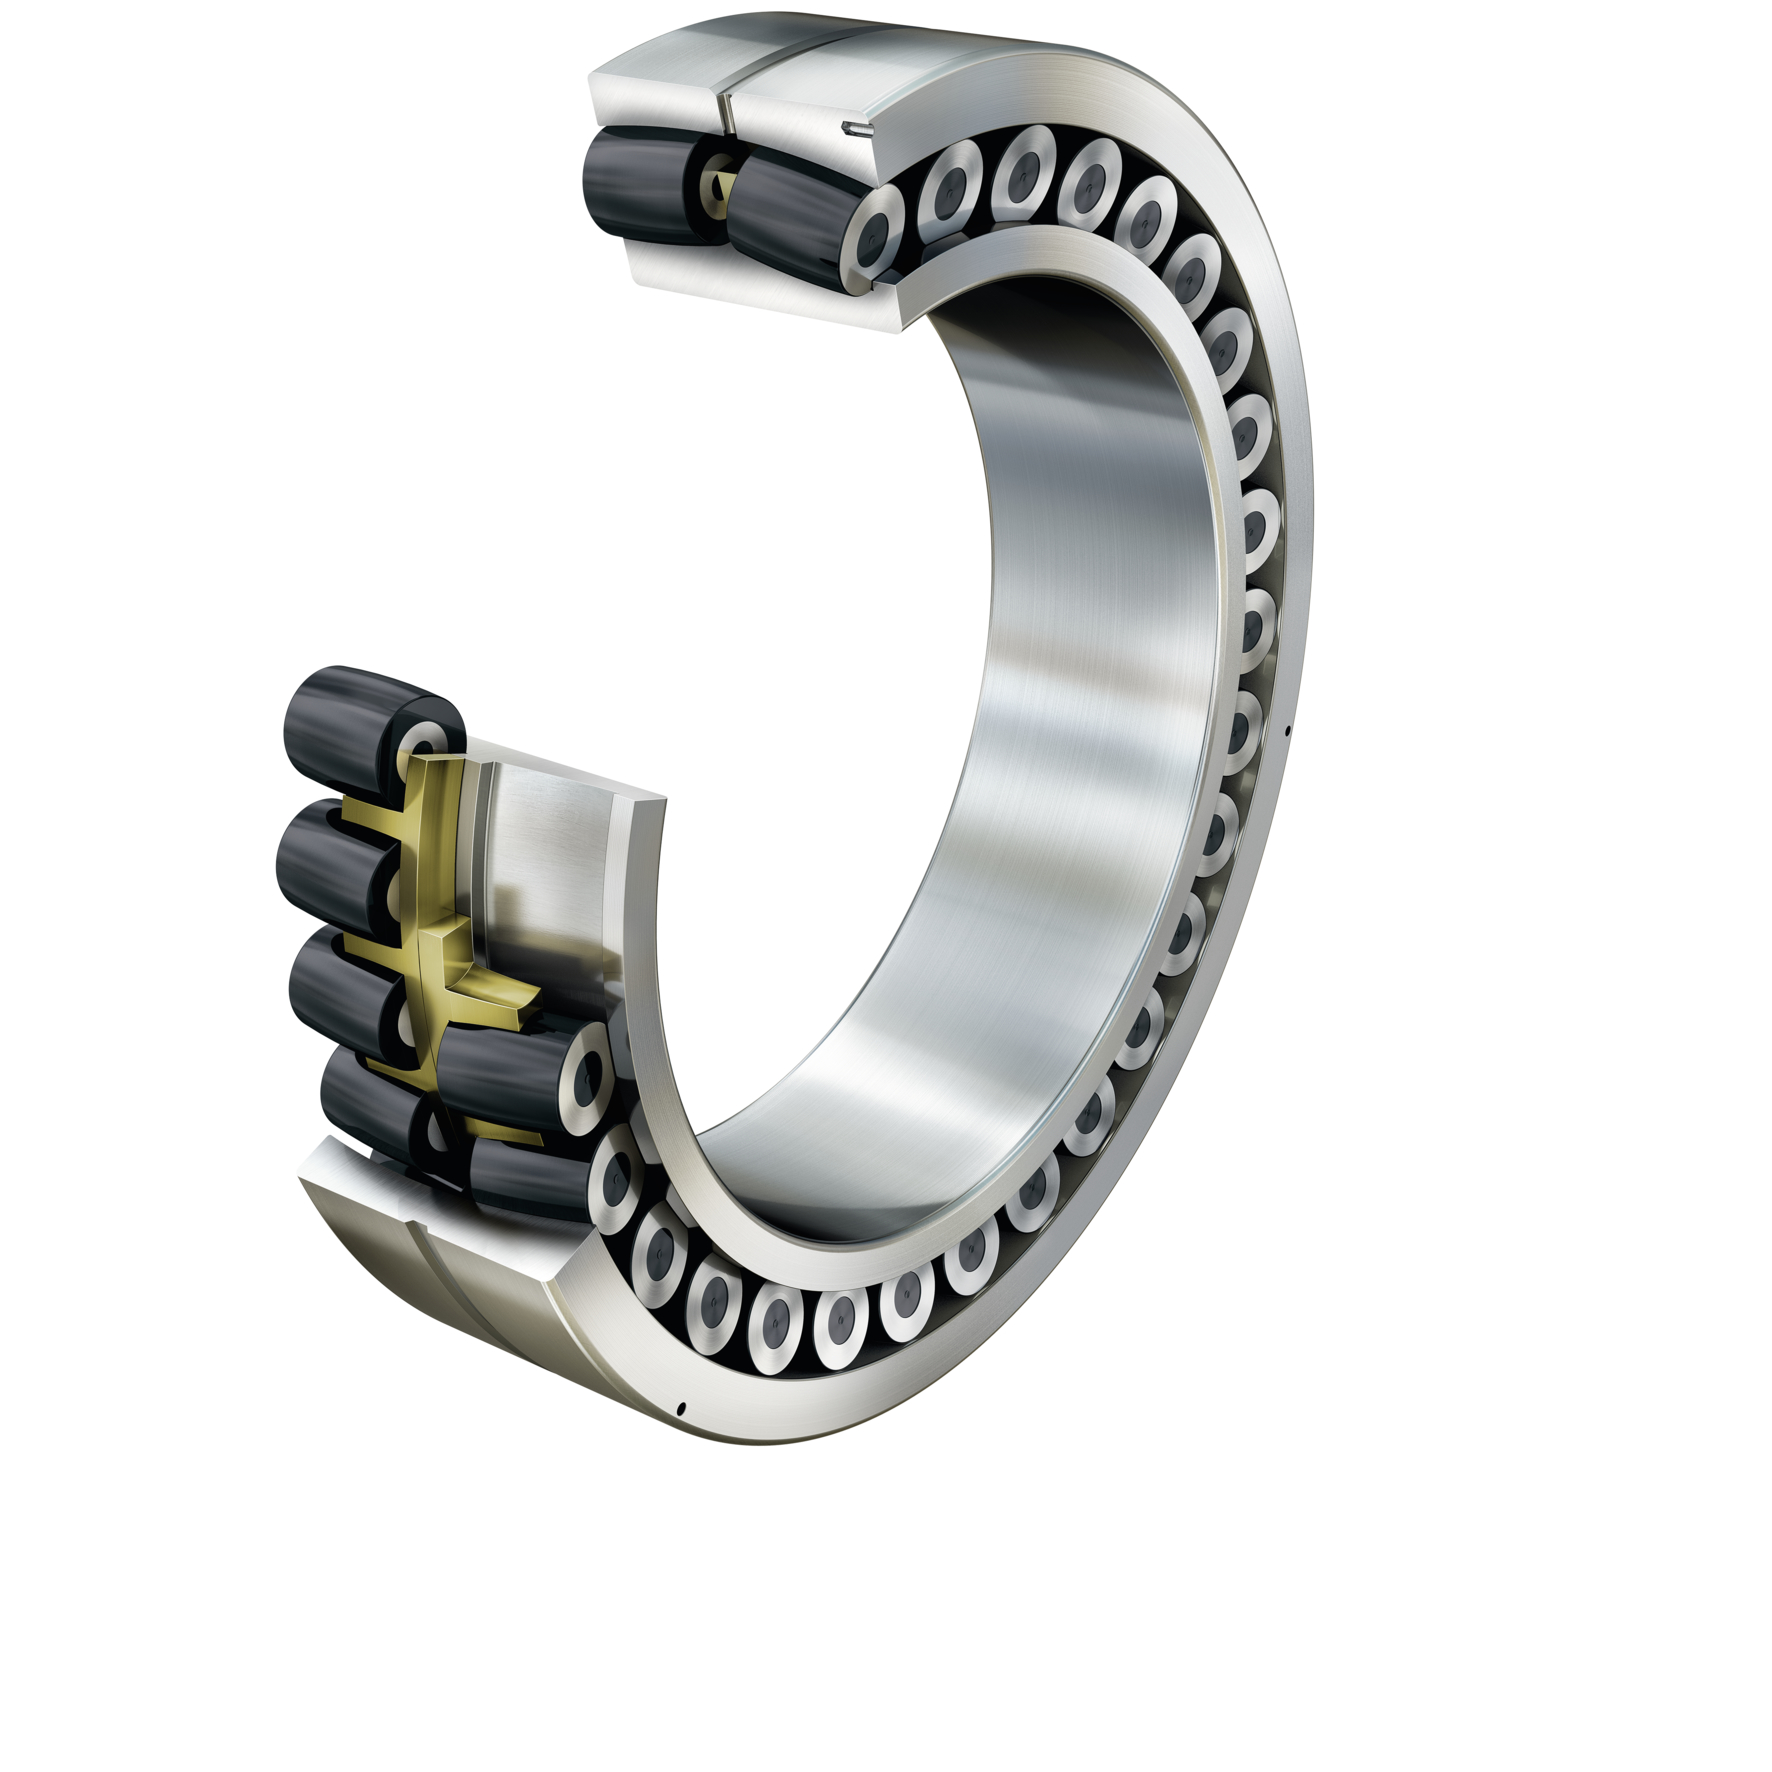 000980E2_asymmetric_bearing Schaeffler's Spherical Roller Bearings Enhance Wind Turbine Efficiency